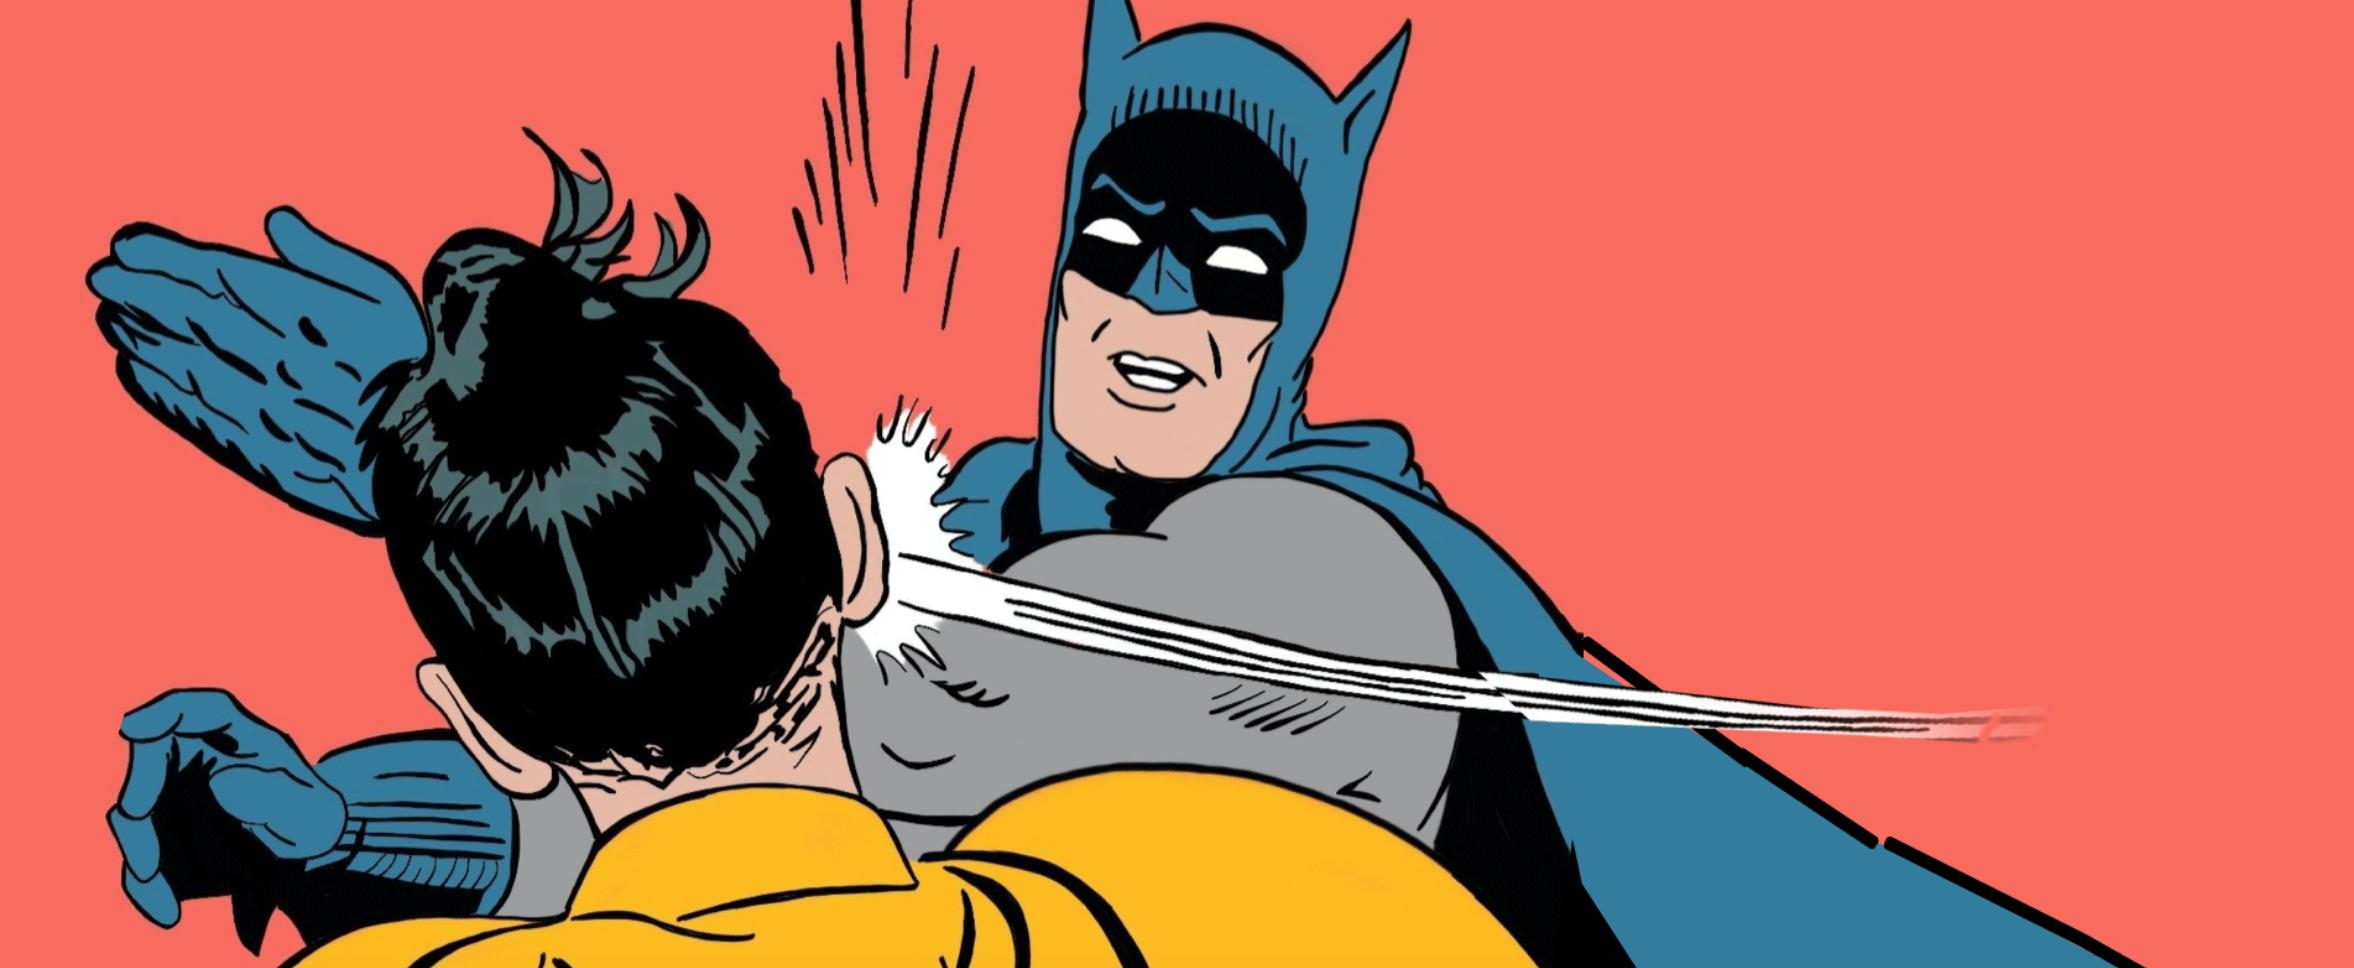 Batman slaps Robin. Source: giphy.com